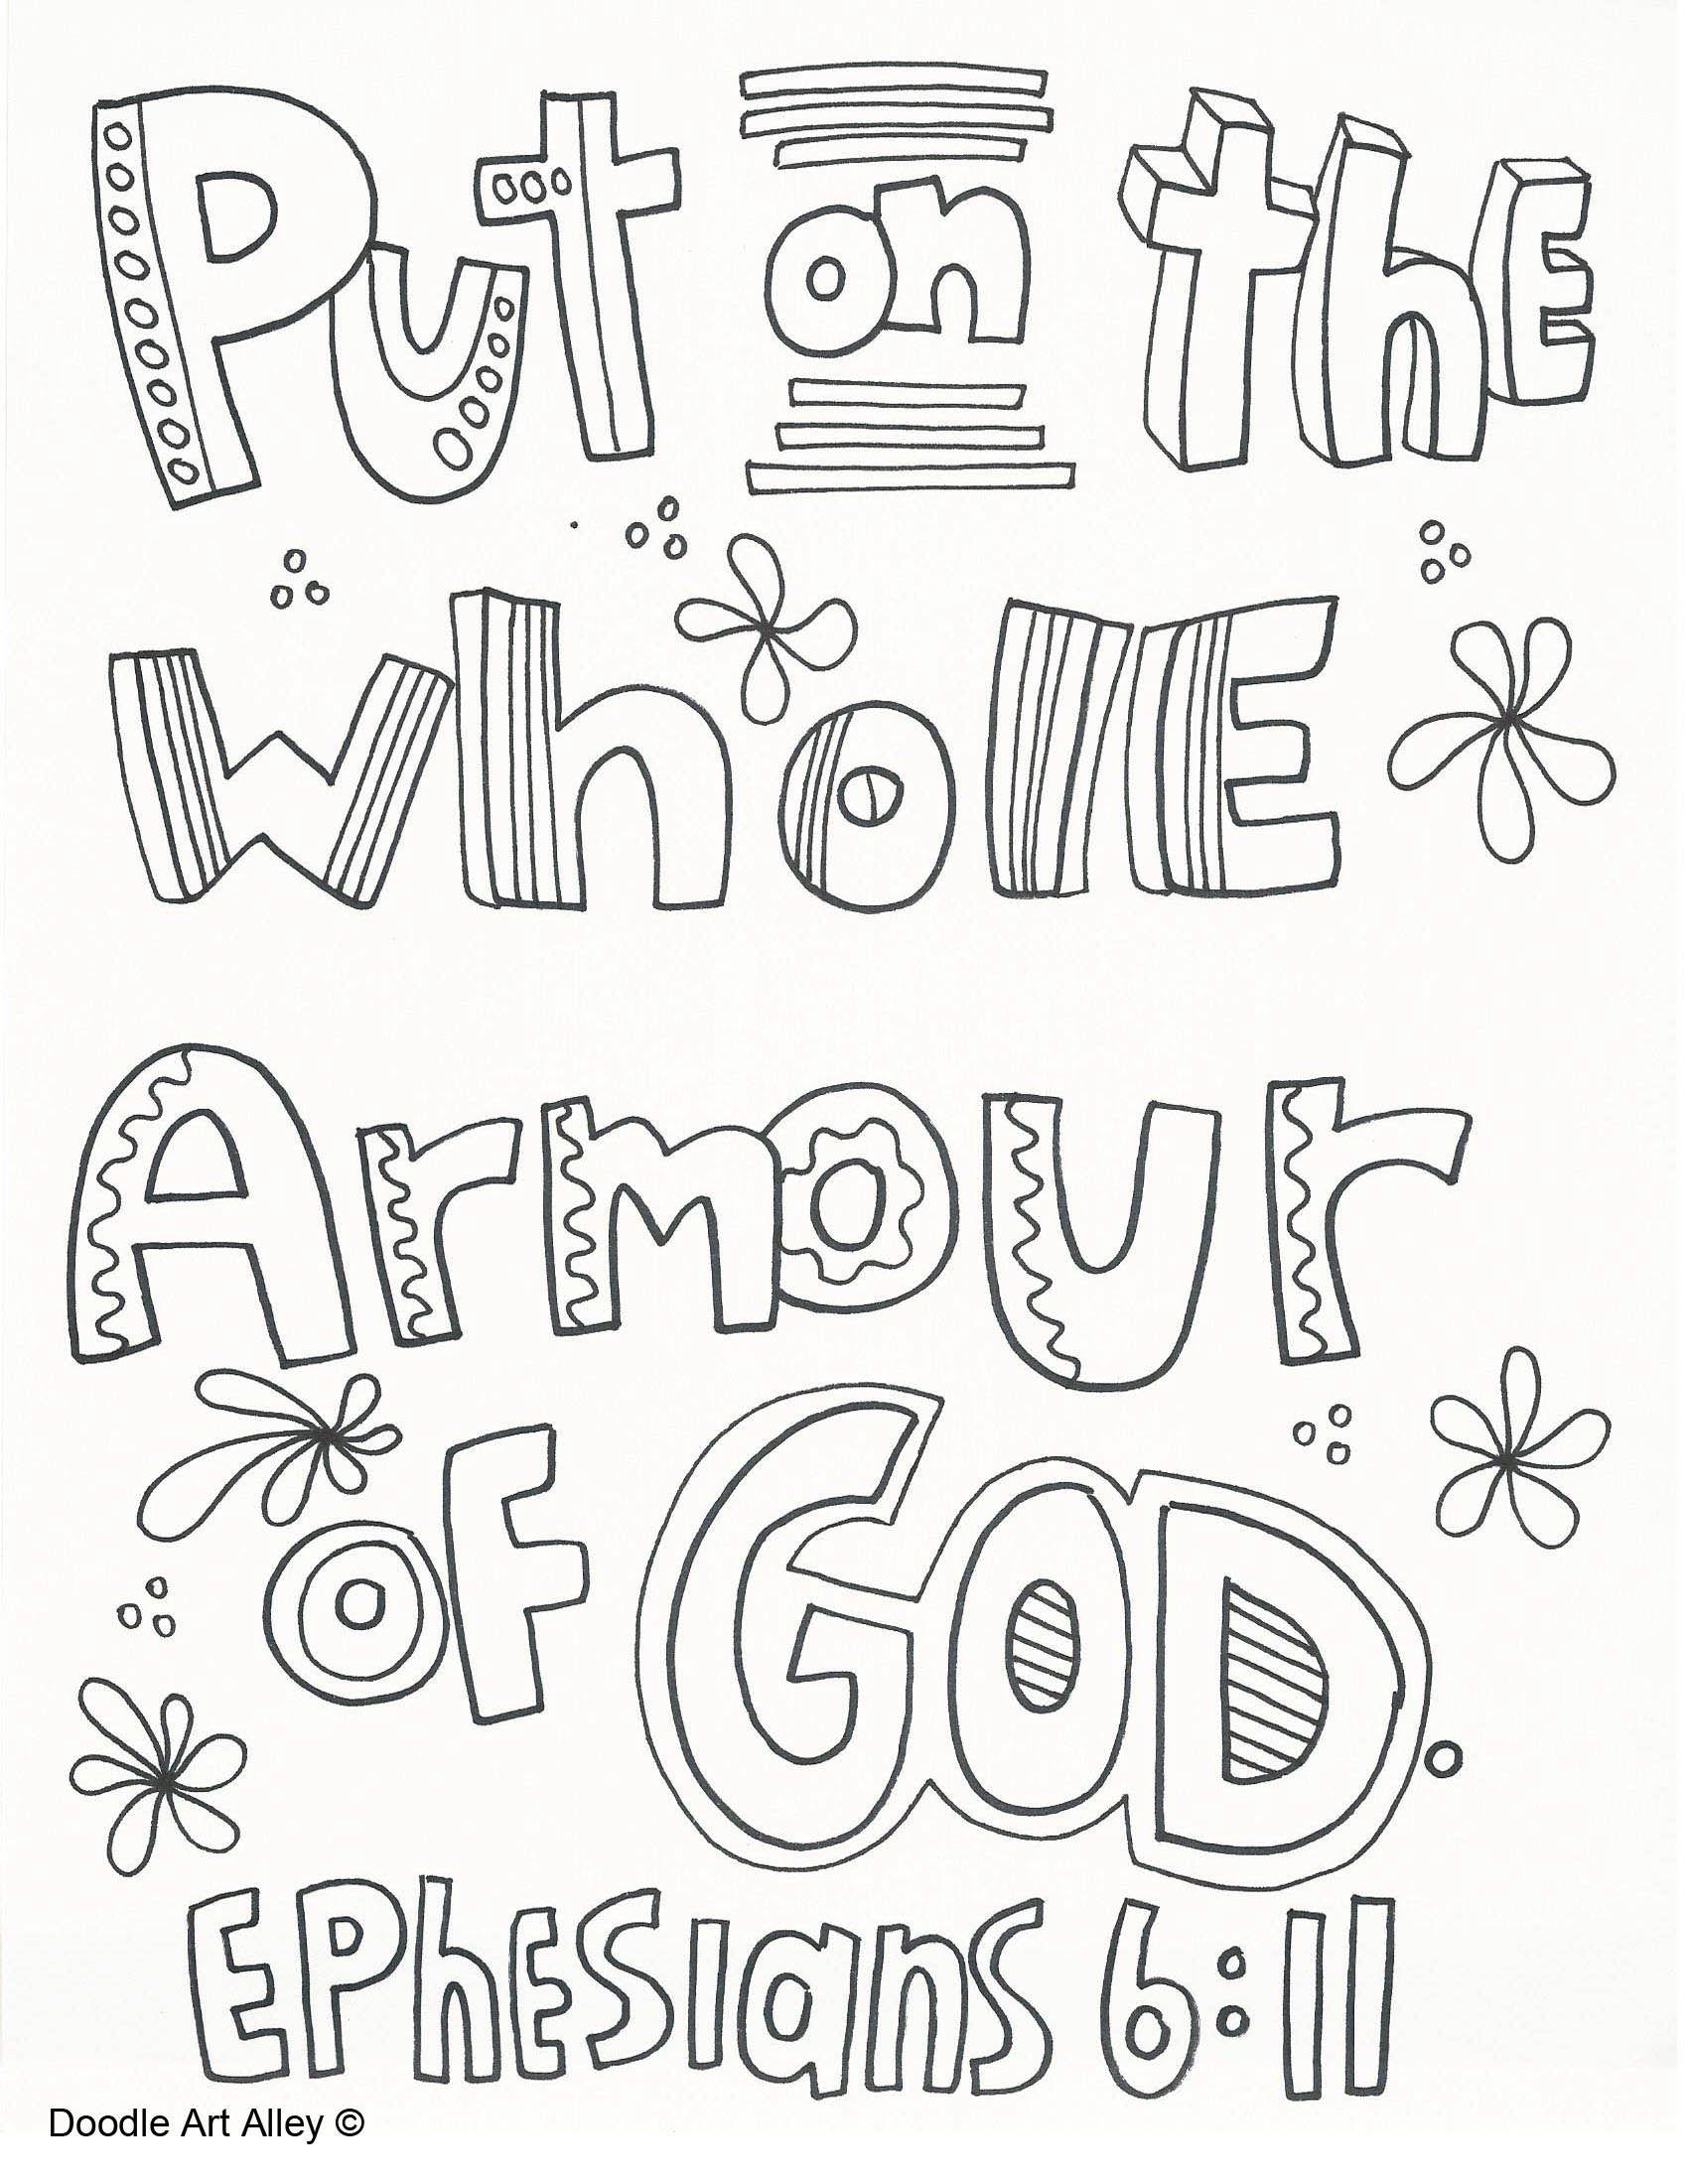 The Christmas Angel Blog Teaching The Armor Of God